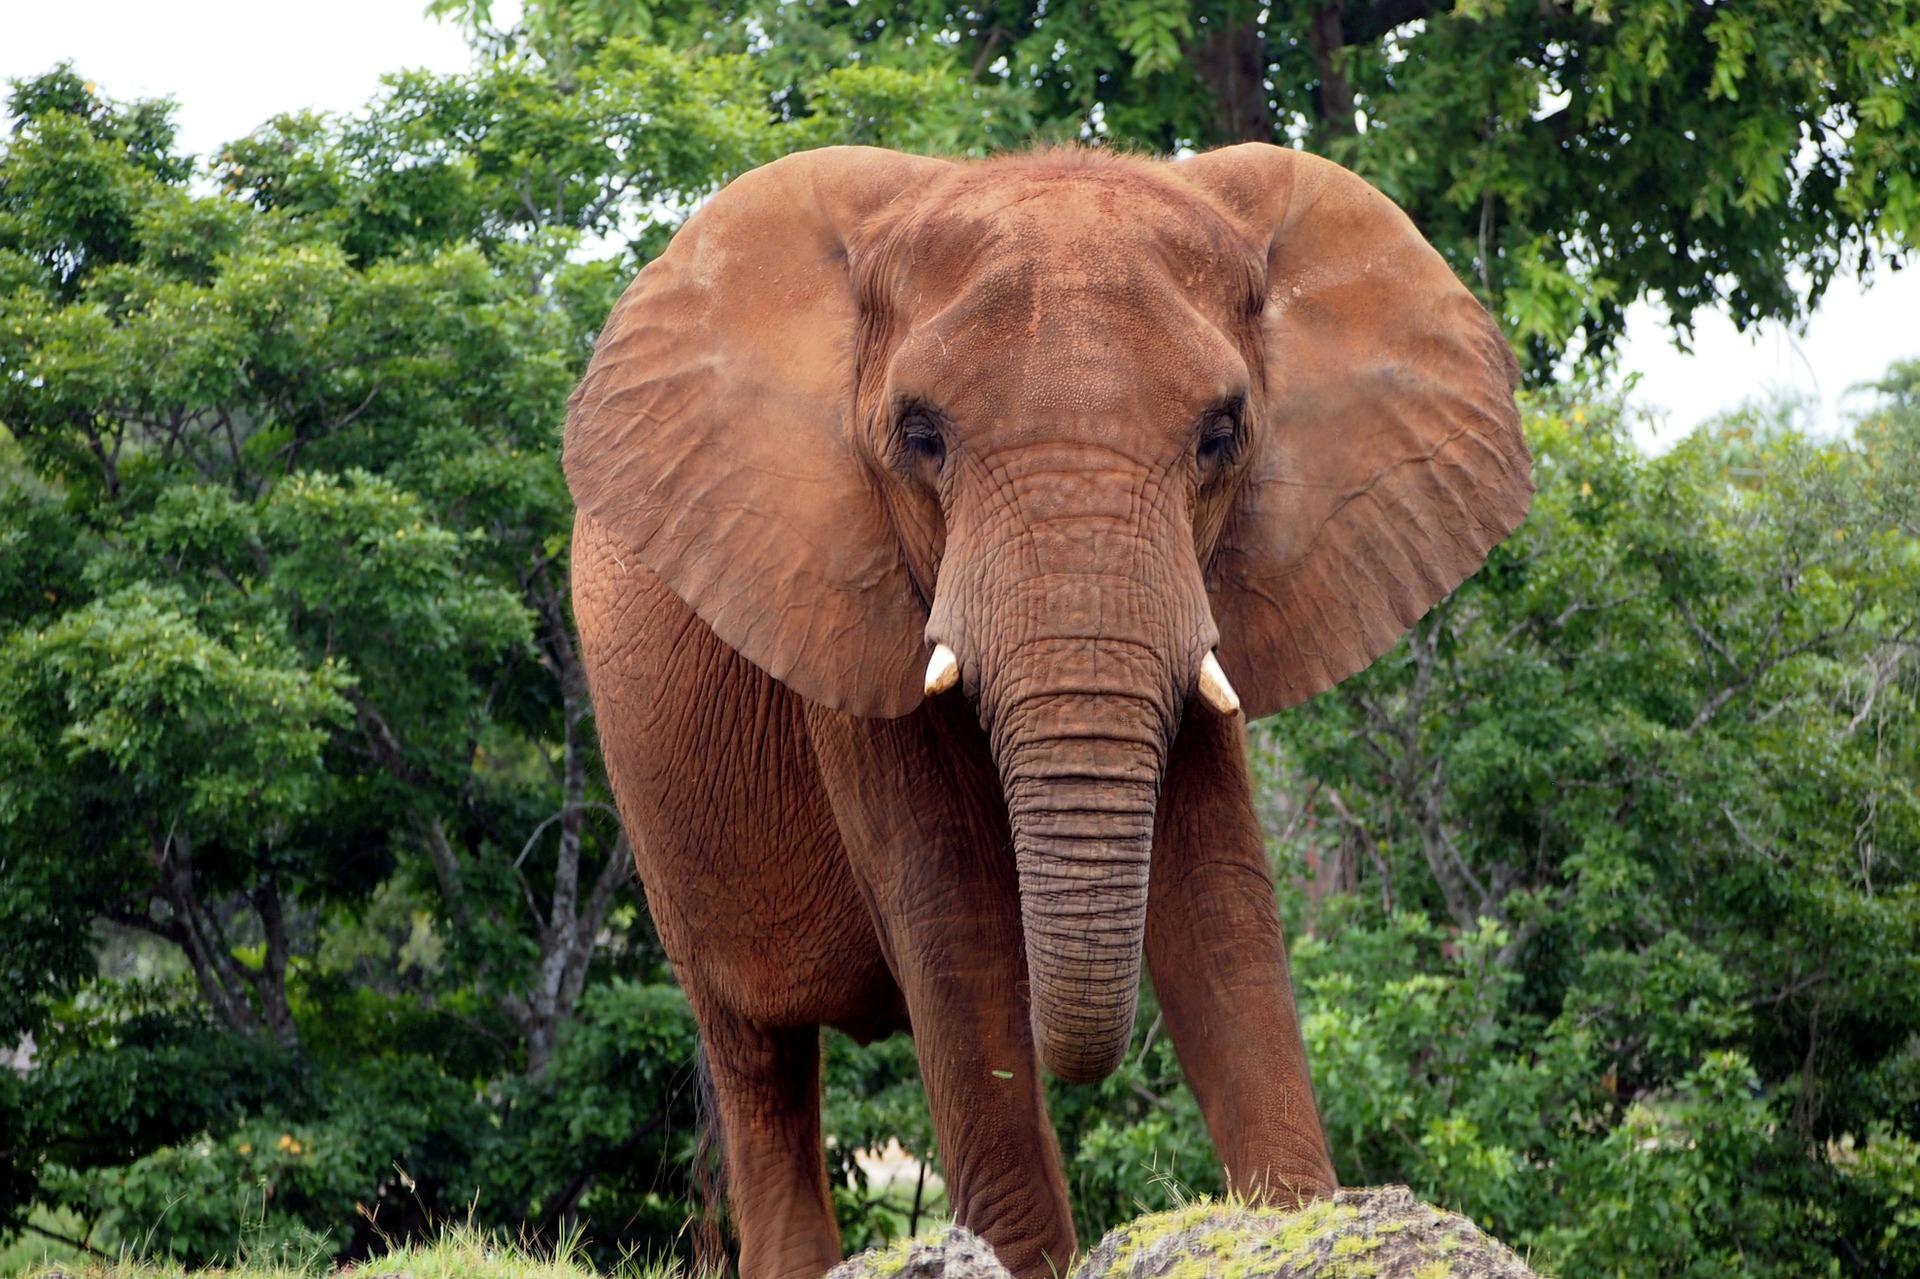 De olifant is slim